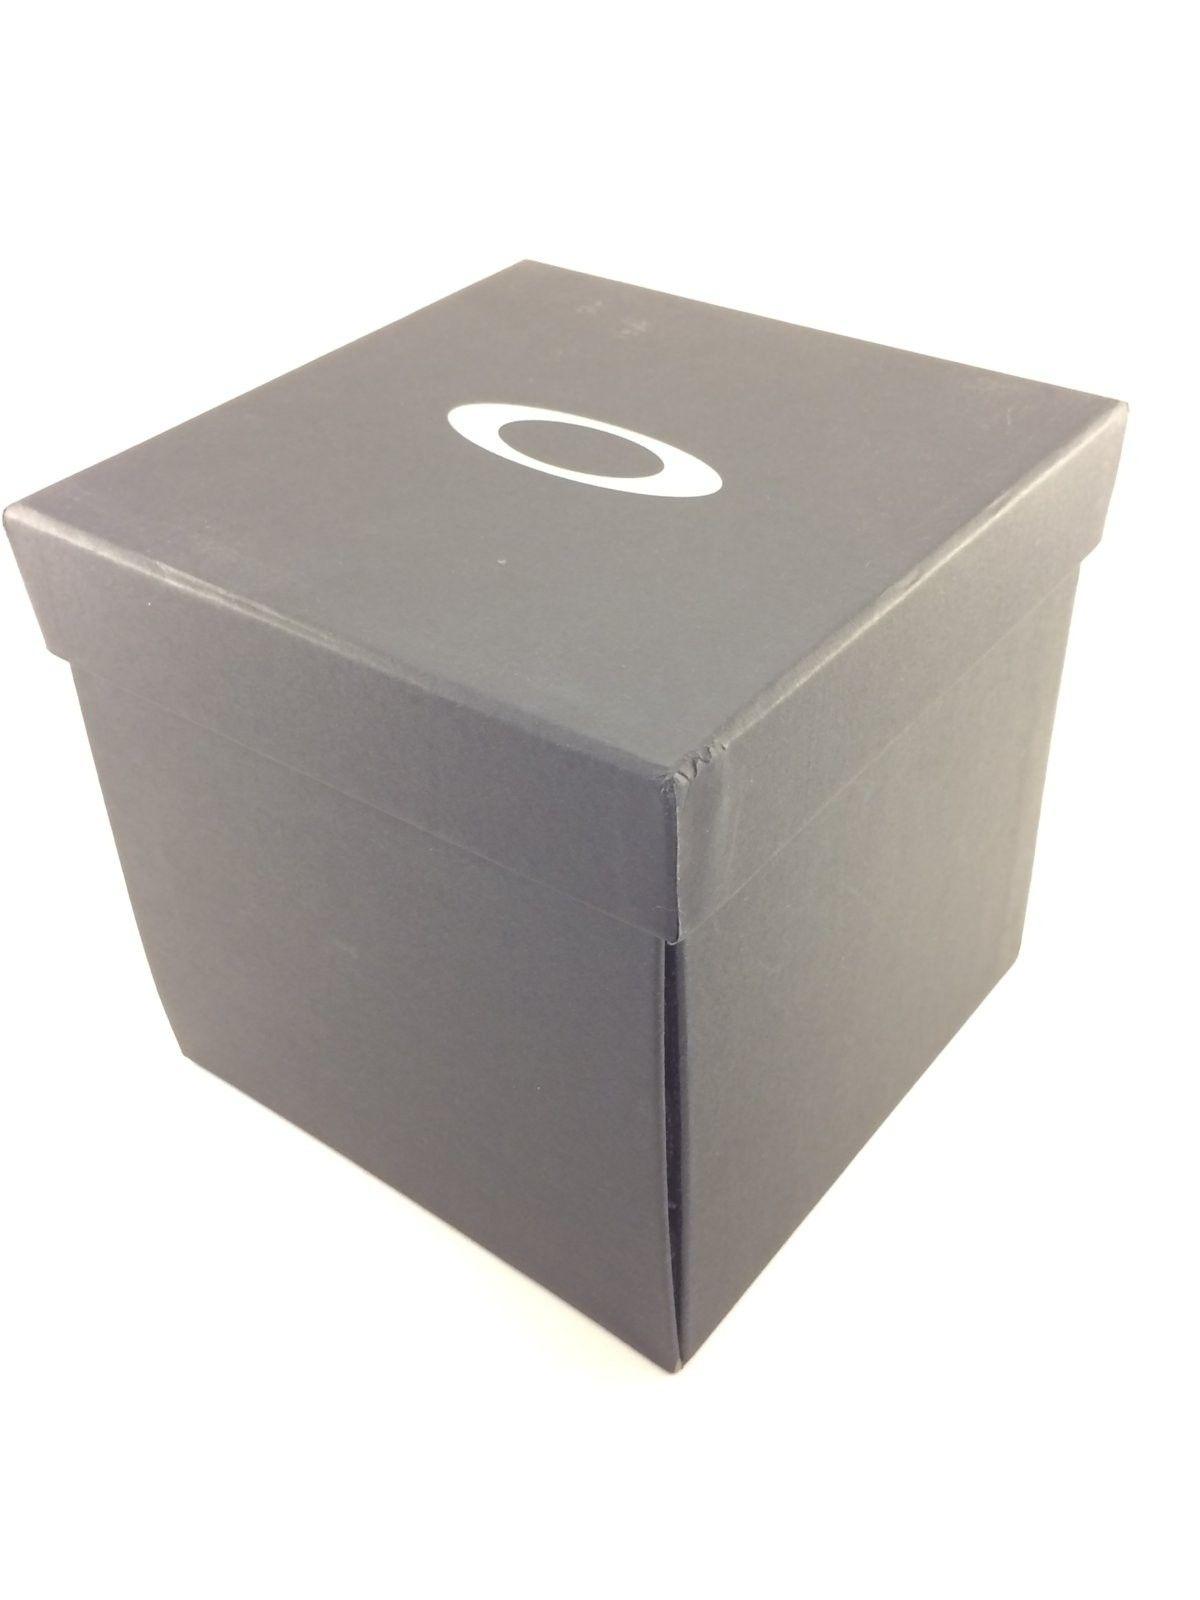 Hollow Point wooden box - HP box 11.JPG